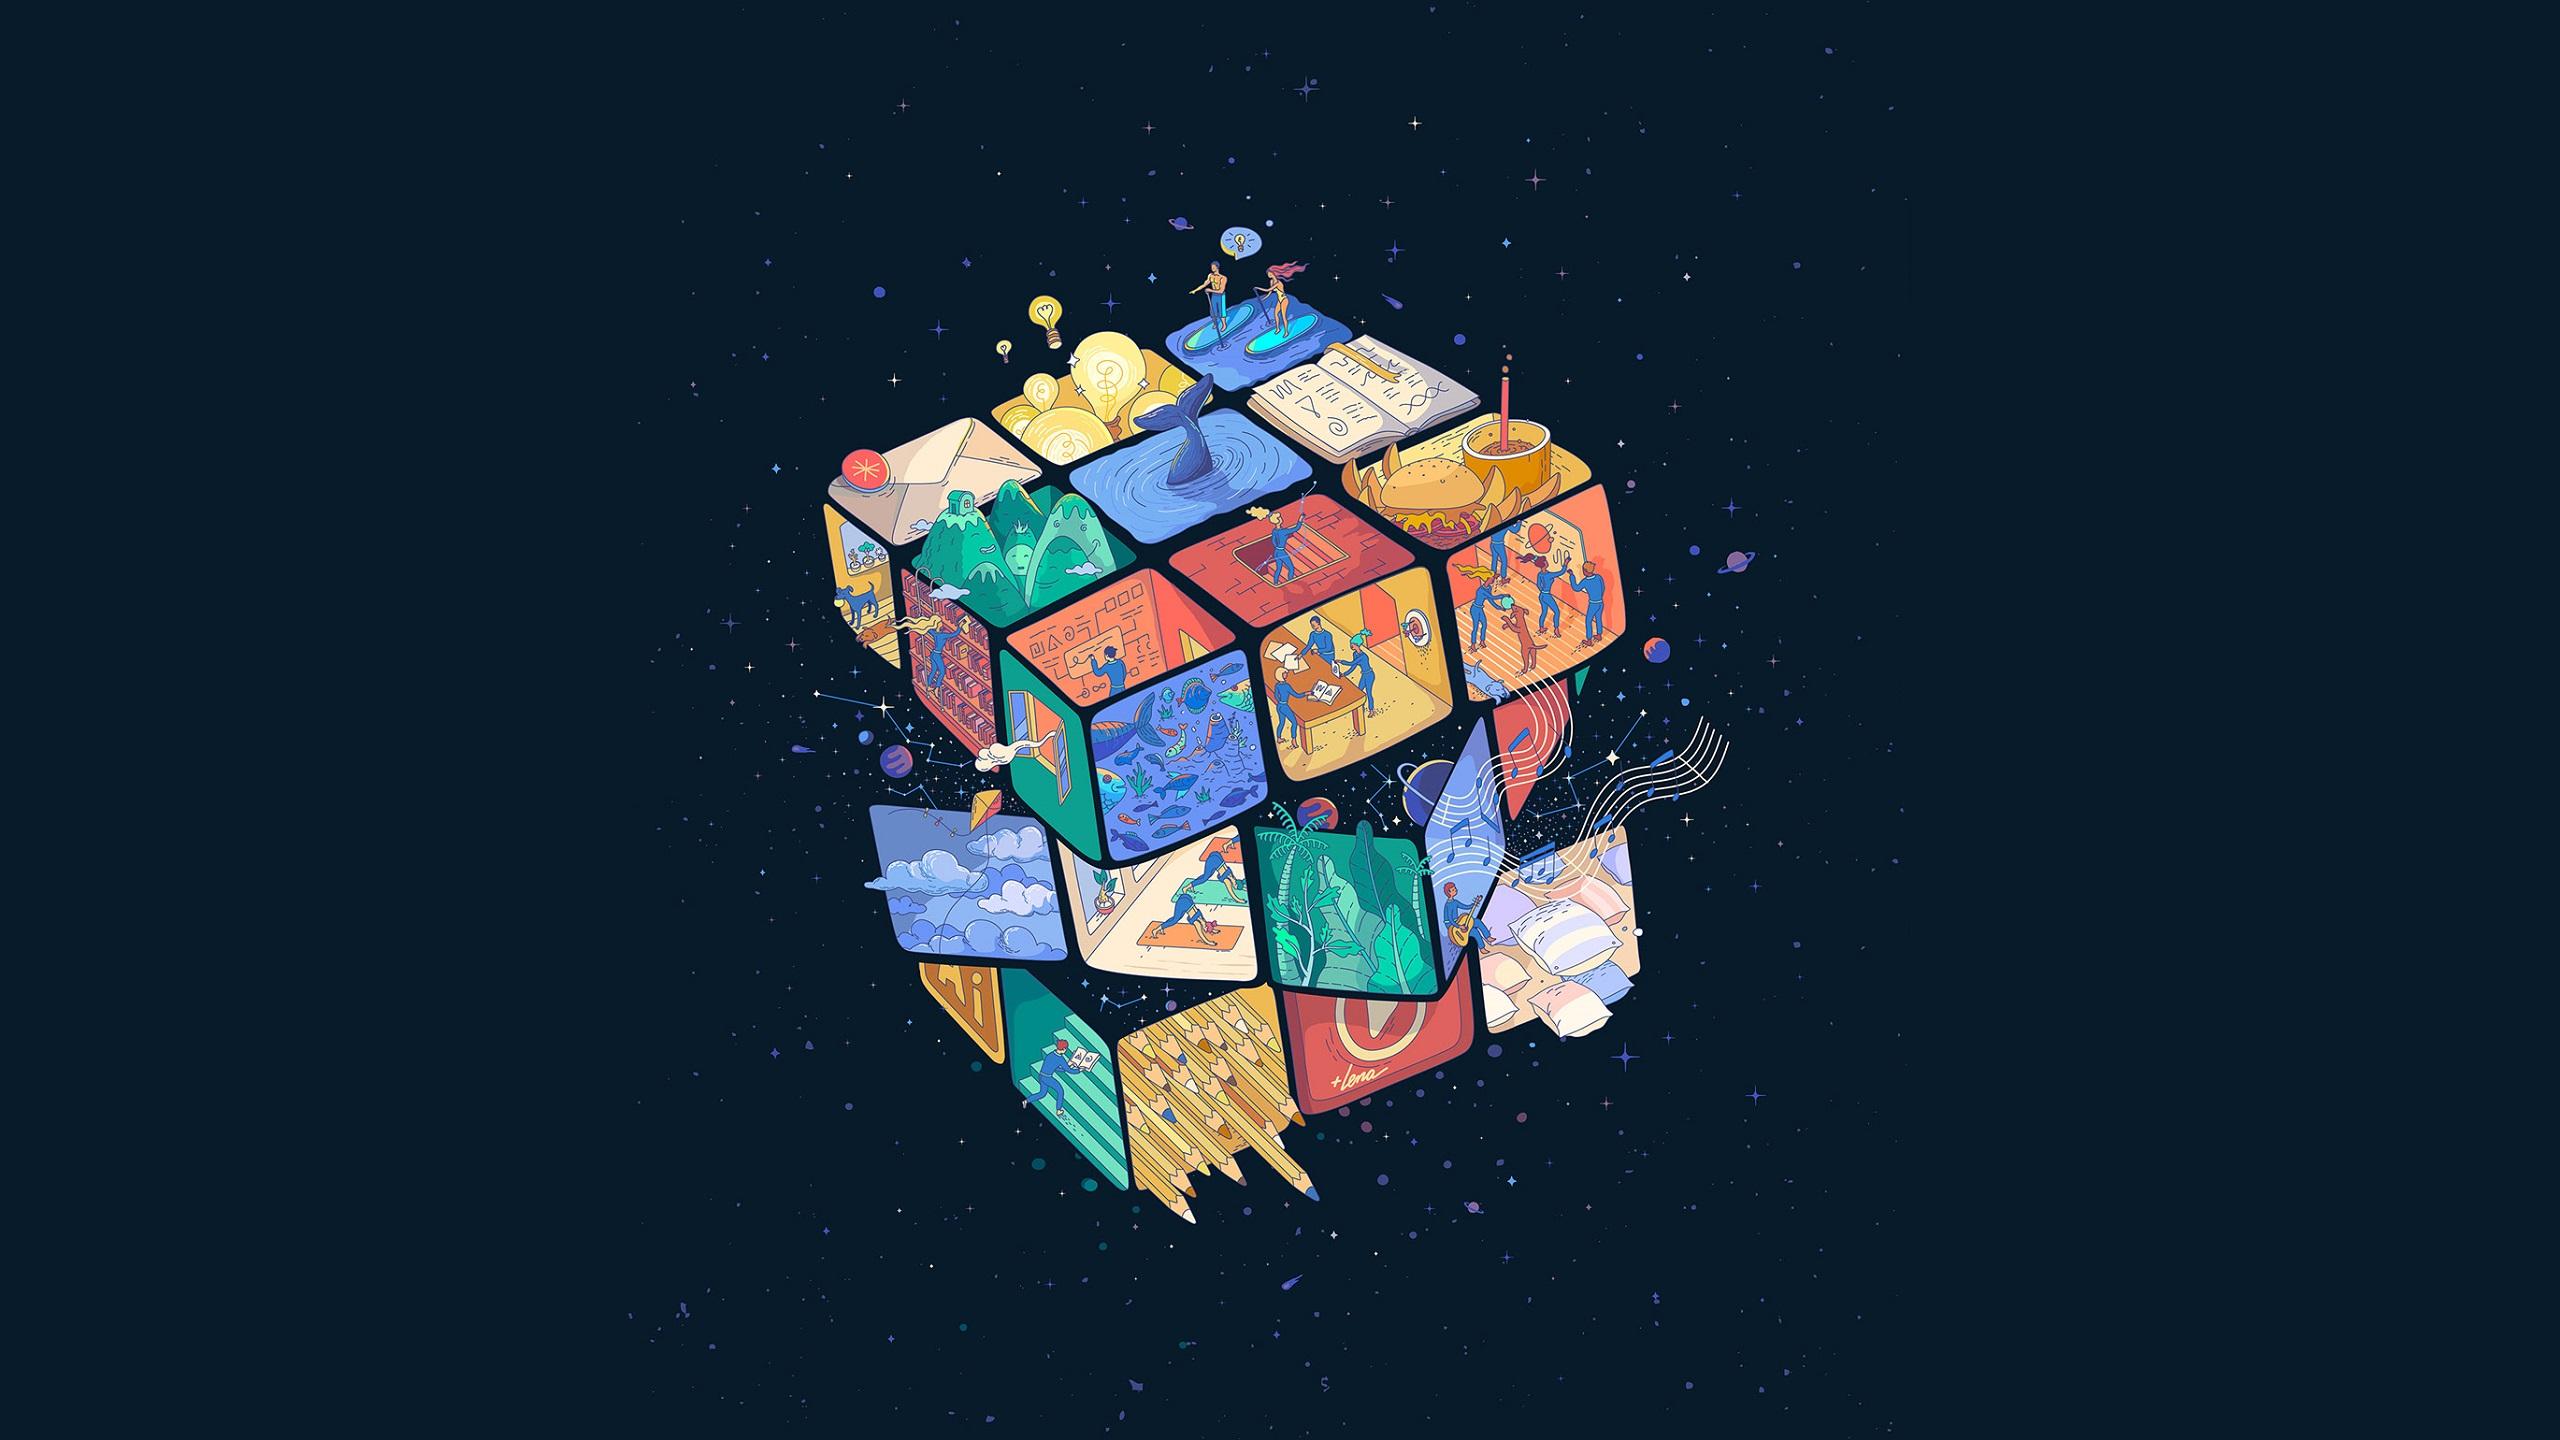 General 2560x1440 artwork digital art Rubik's Cube 3D abstract 3D Blocks simple background blue background cube